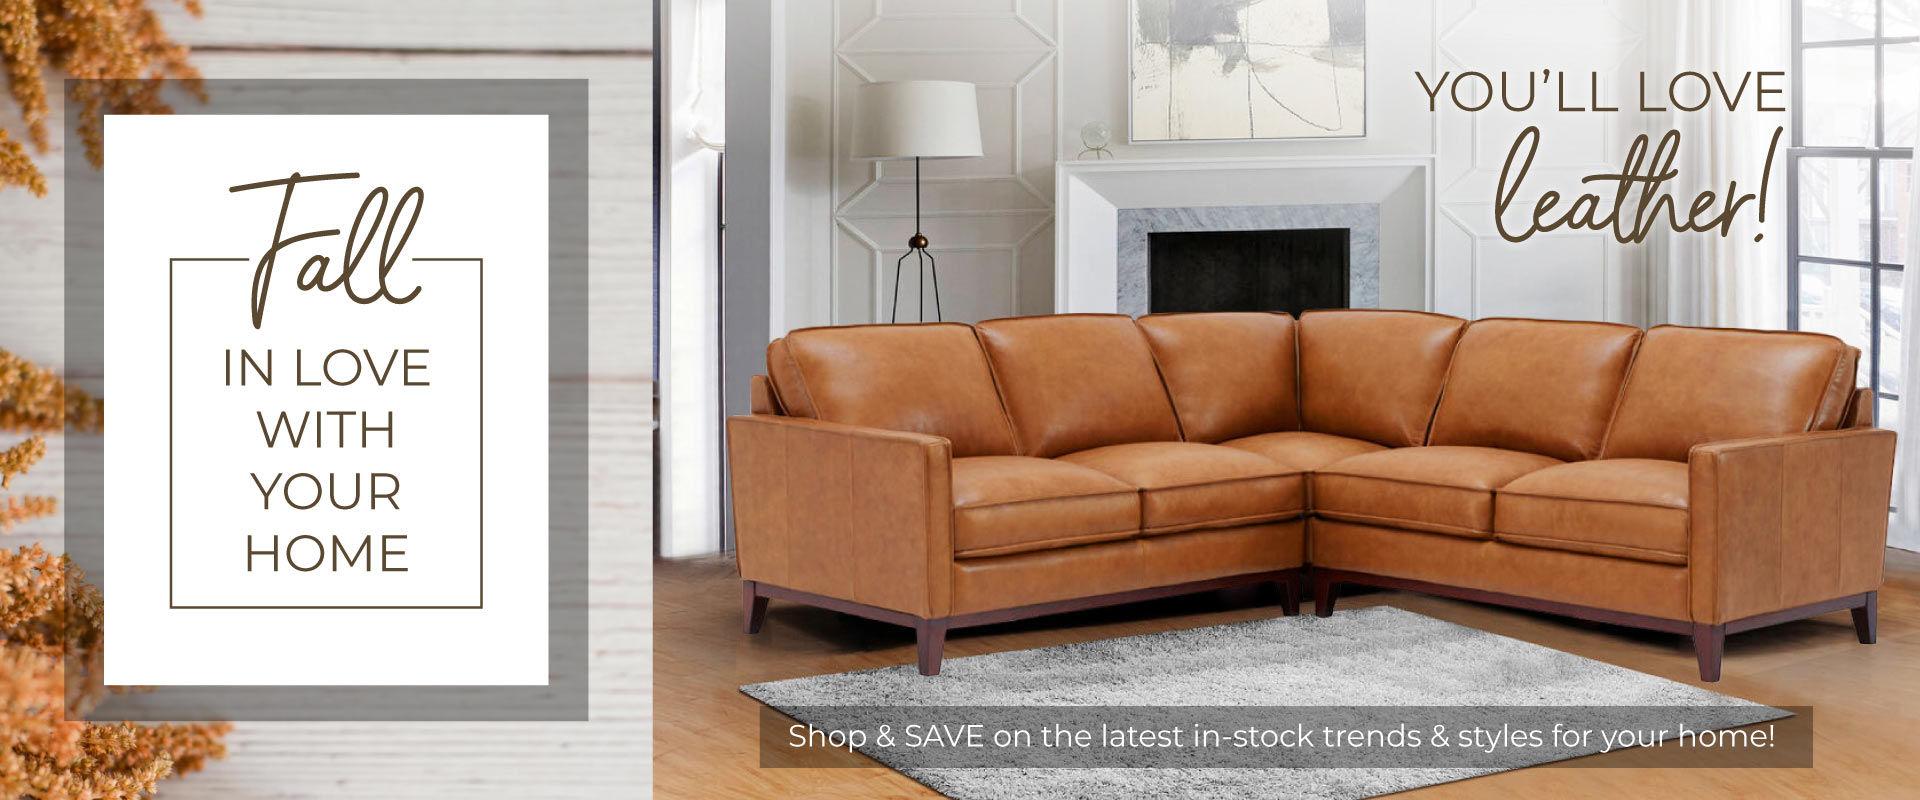 Fall In Love - Leather Furniture